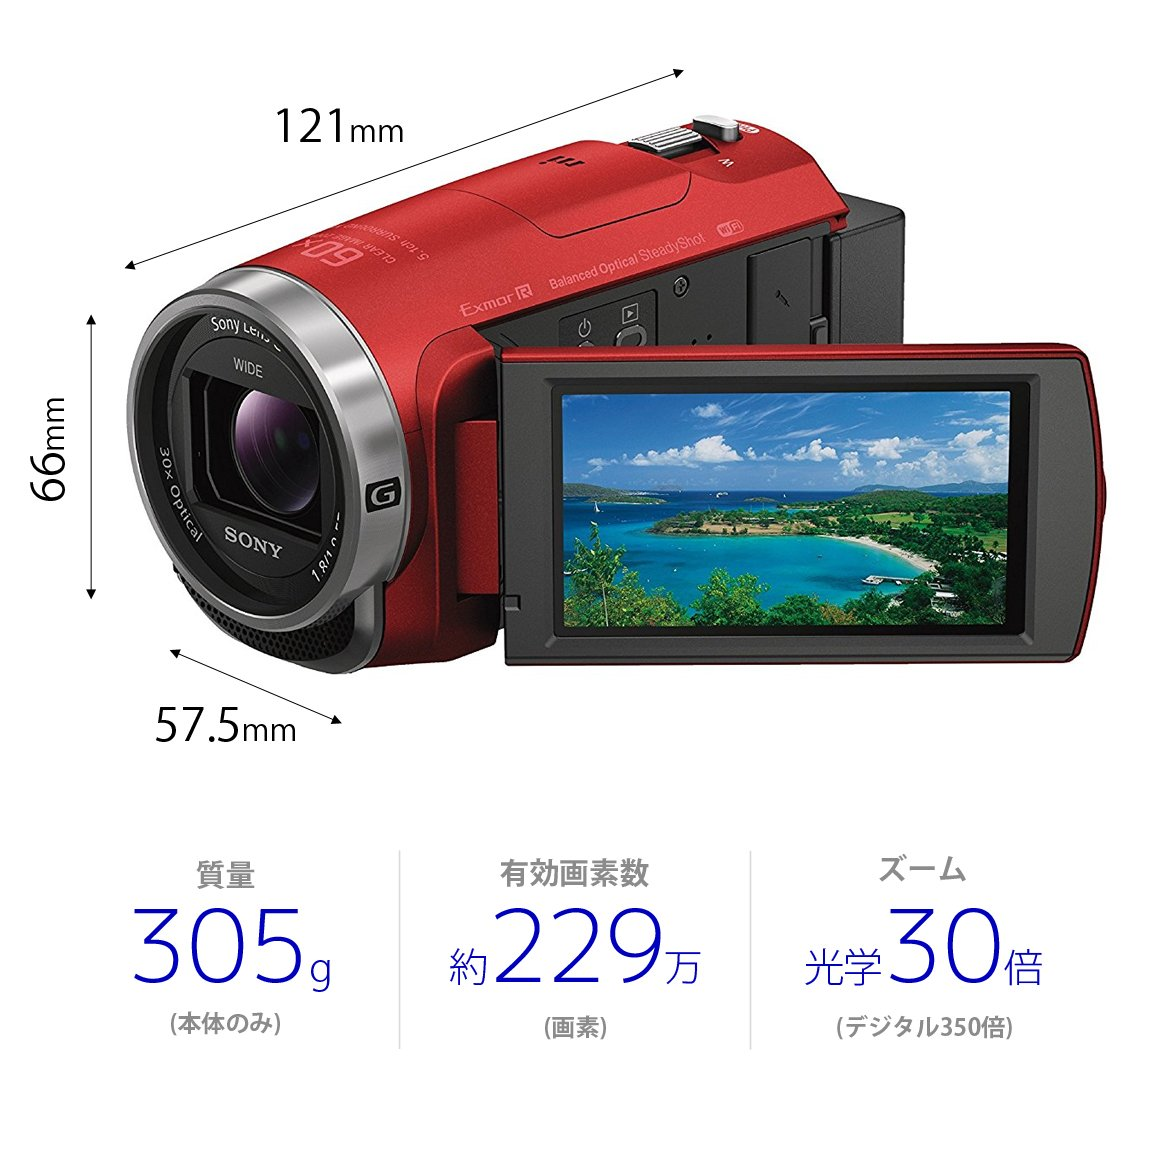 Vivitar DVR995WHD-GRP-IT Action Camera Navitech Adjustable Shoulder Body Strap Harness Mount Holder Compatible with The Vivitar DVR785HD-BLU 5MP